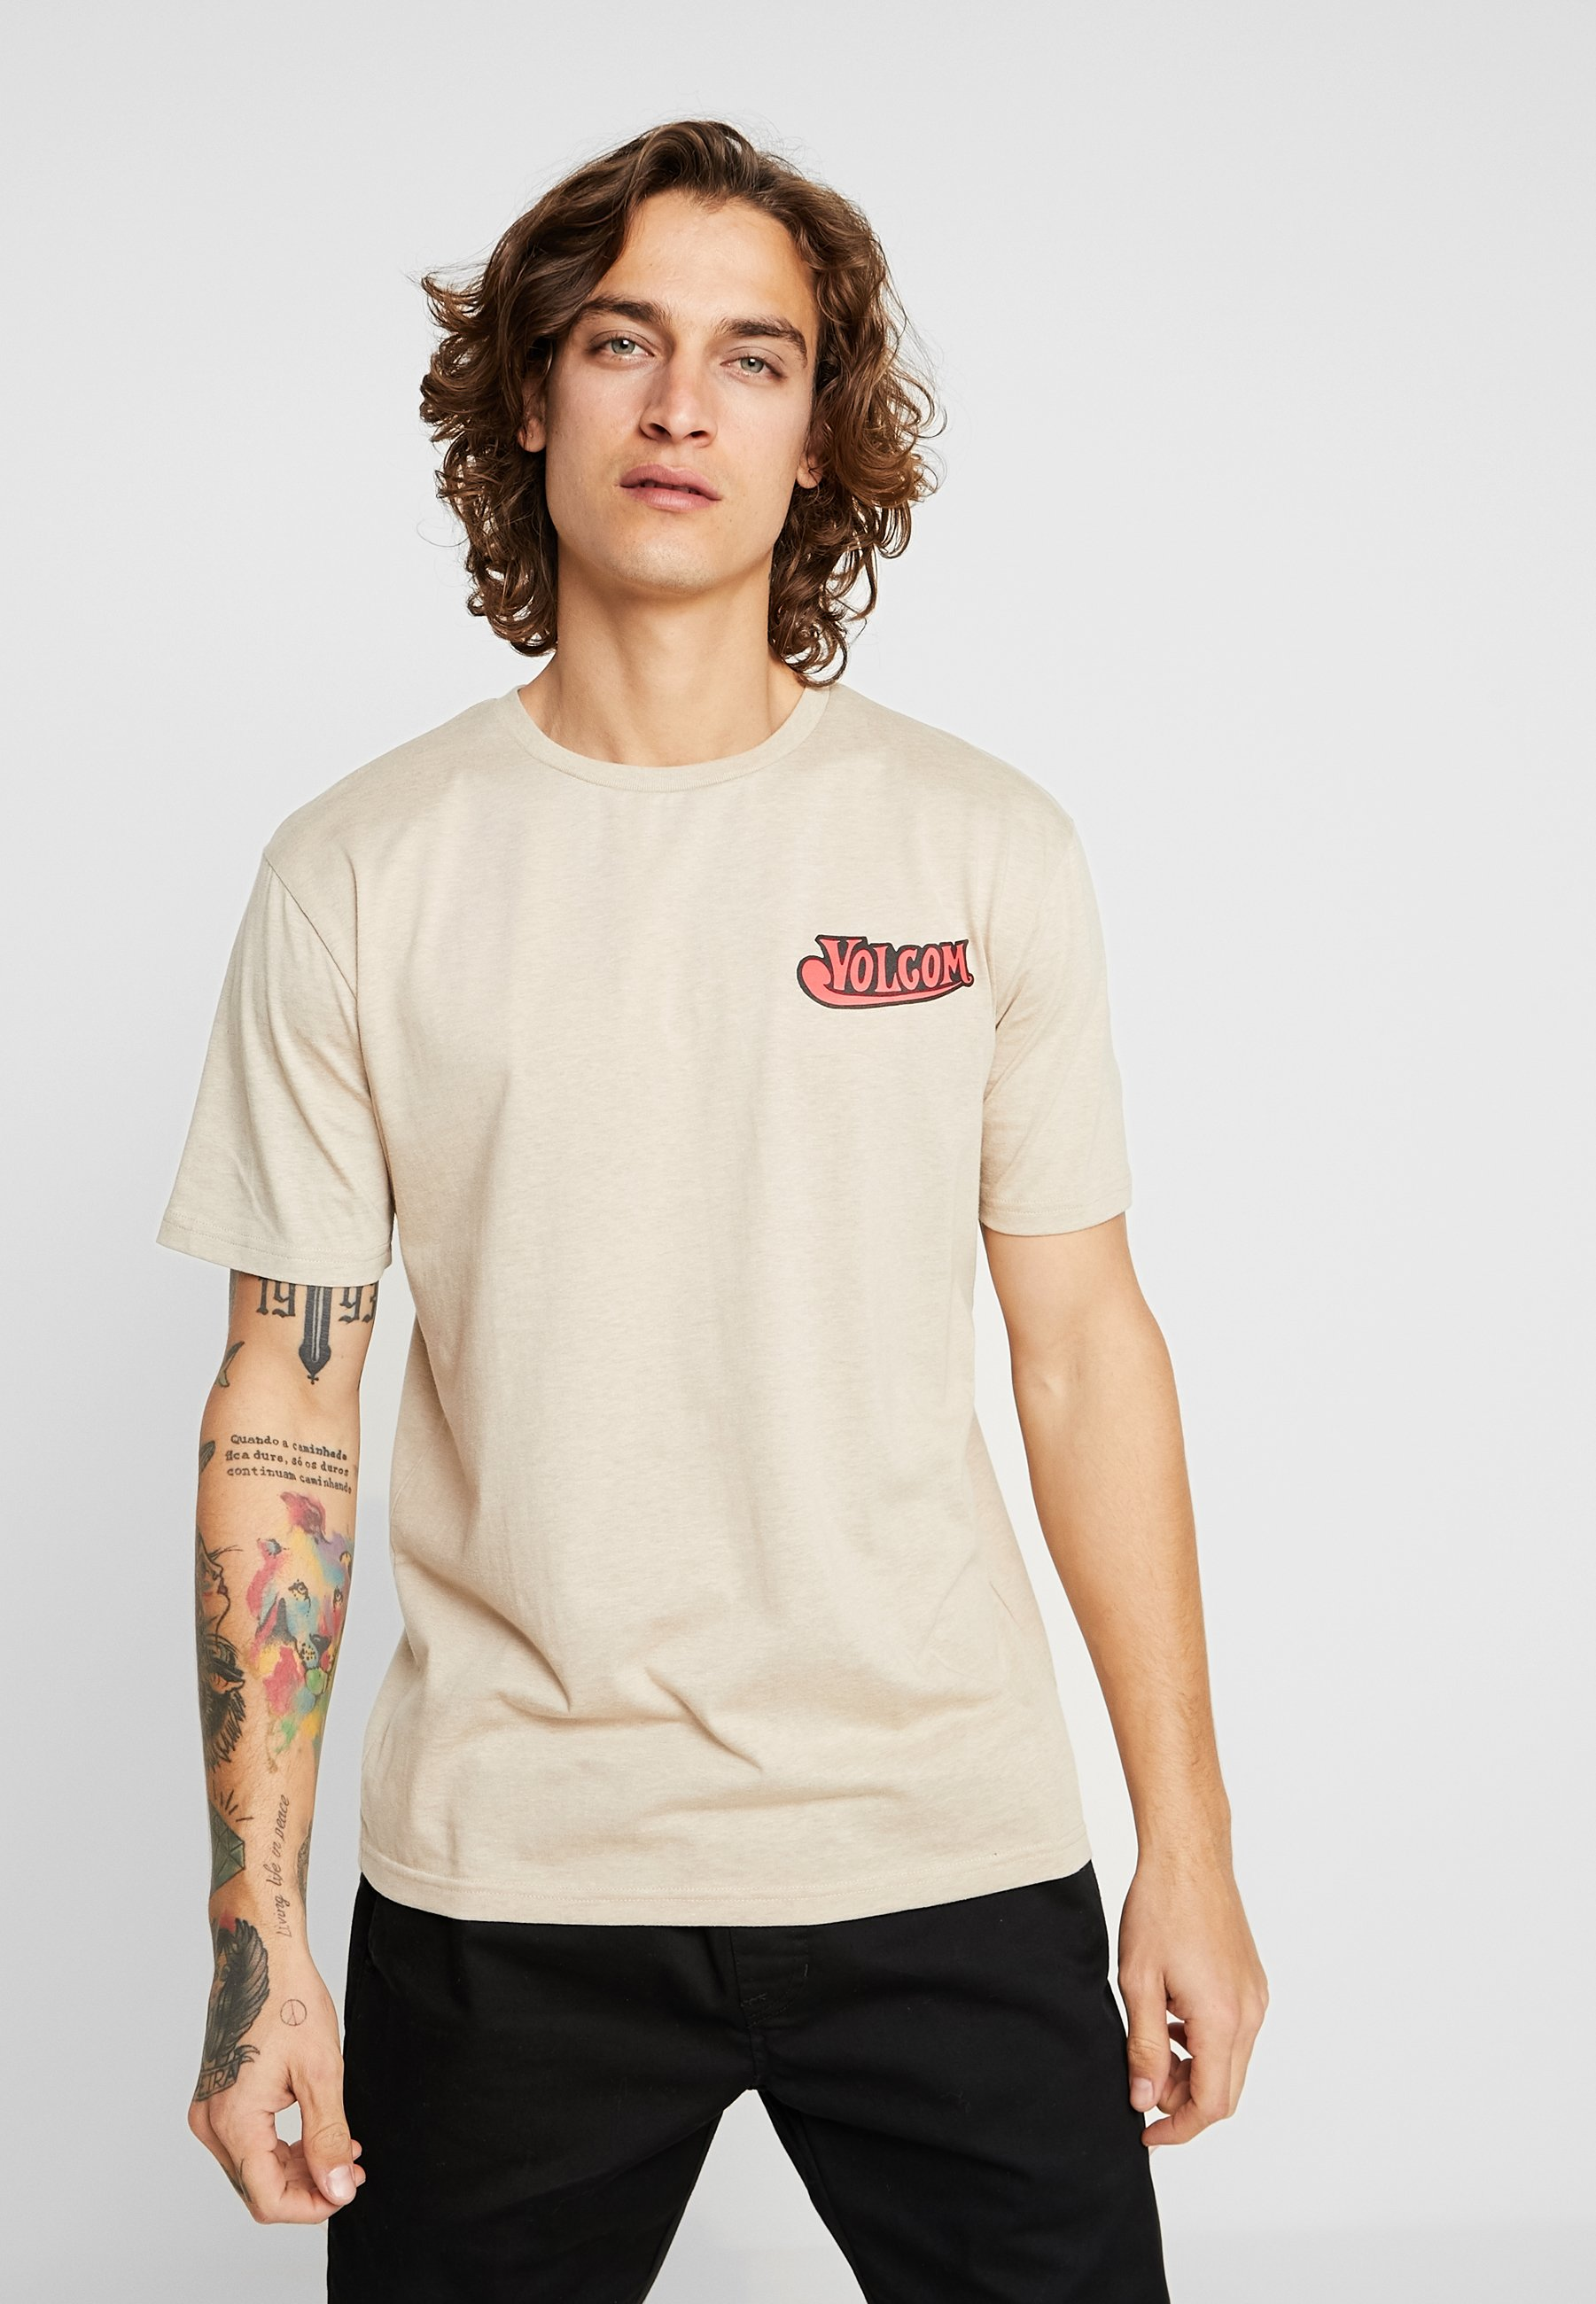 Glorious Oatmeal BeerT shirt Imprimé Volcom TOZiukXPw